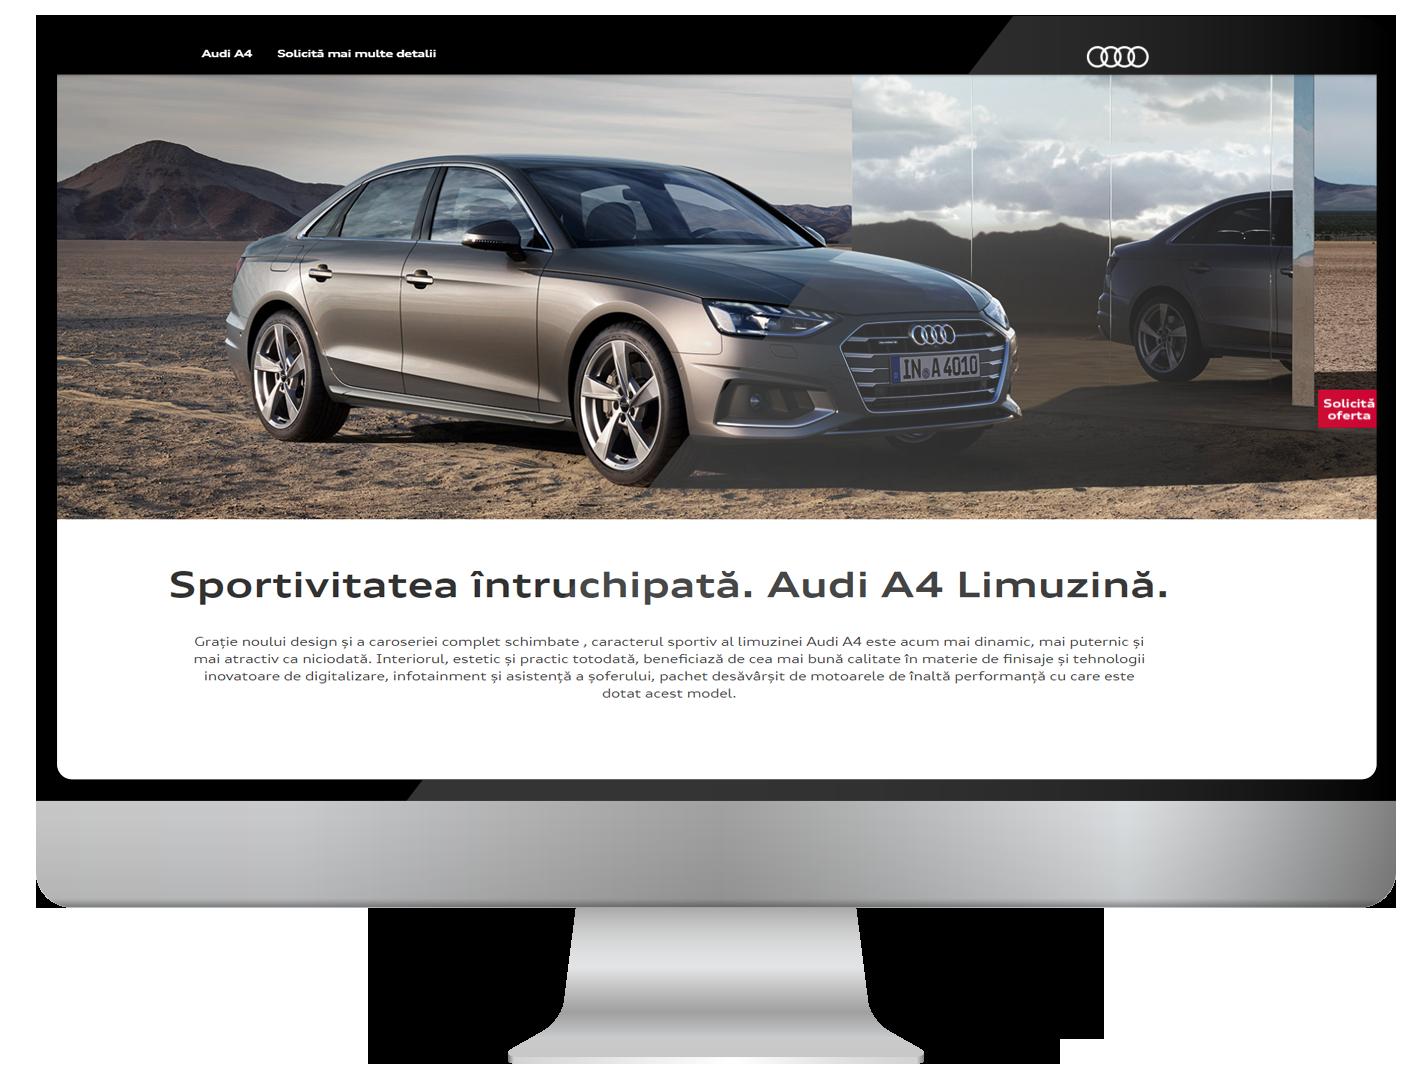 Audi A4 takes the lead